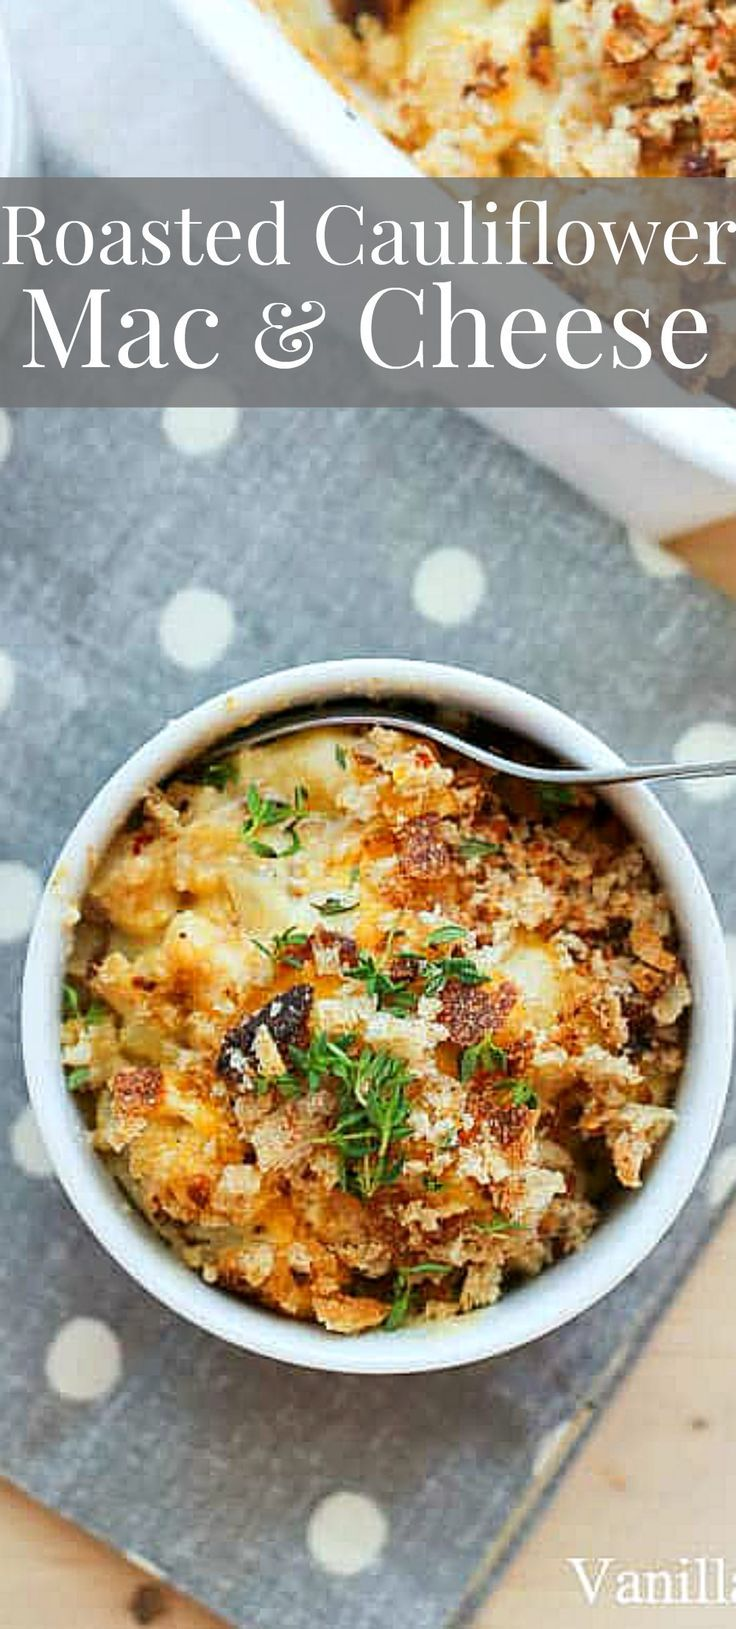 Stealthy Veggies Shine In This Creamy Cheesy Roasted Cauliflower Mac Cheese Vegetarian Veggie Recipes Vegetarian Recipes Healthy Vegetarian Recipes Dinner